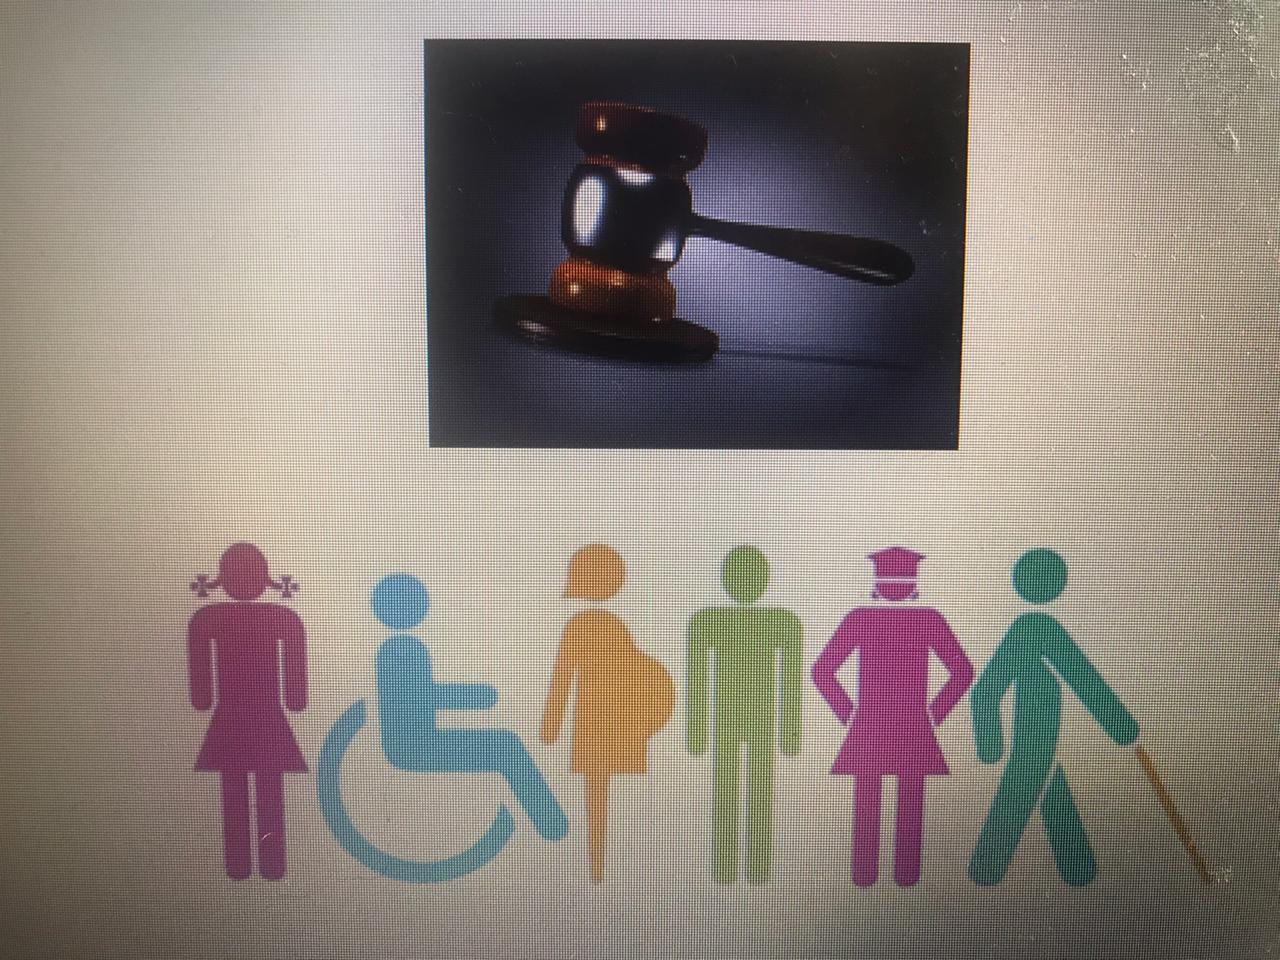 Mengintip Di Balik Adanya Paham Kesetaraan Gender  Pada e-Auction